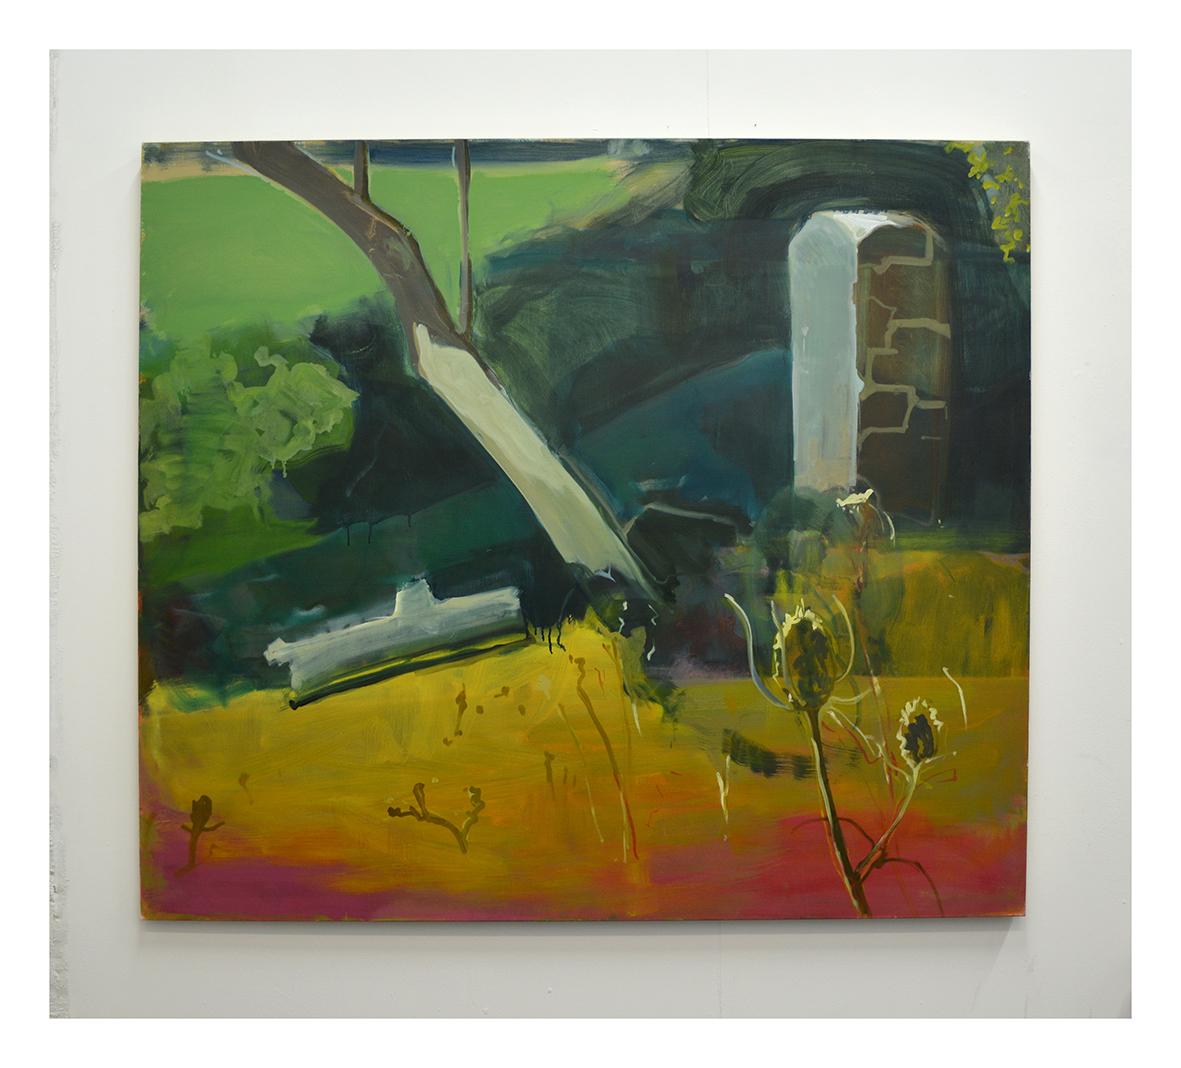 Landscape oil on linen 160x140cm 2020